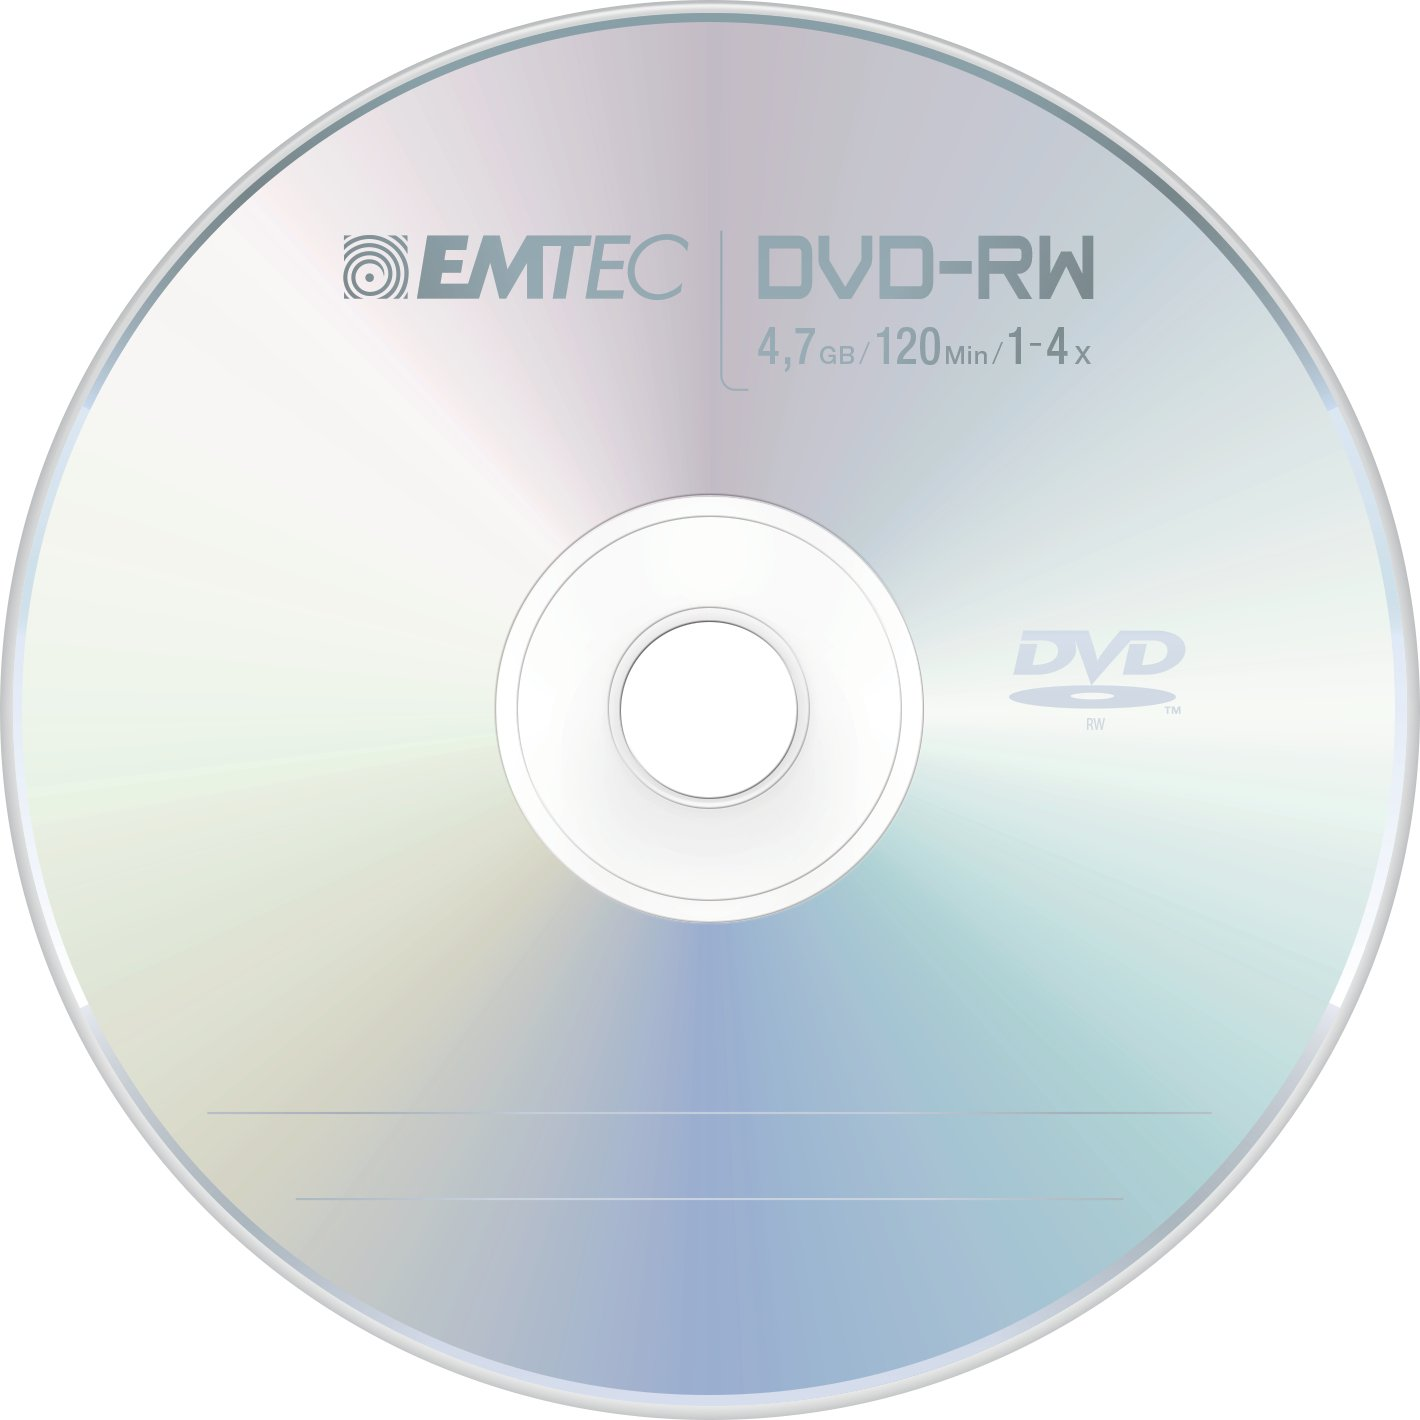 Emtec disc DVD-RW [ cakebox 10 | 4.7GB | 4x ]